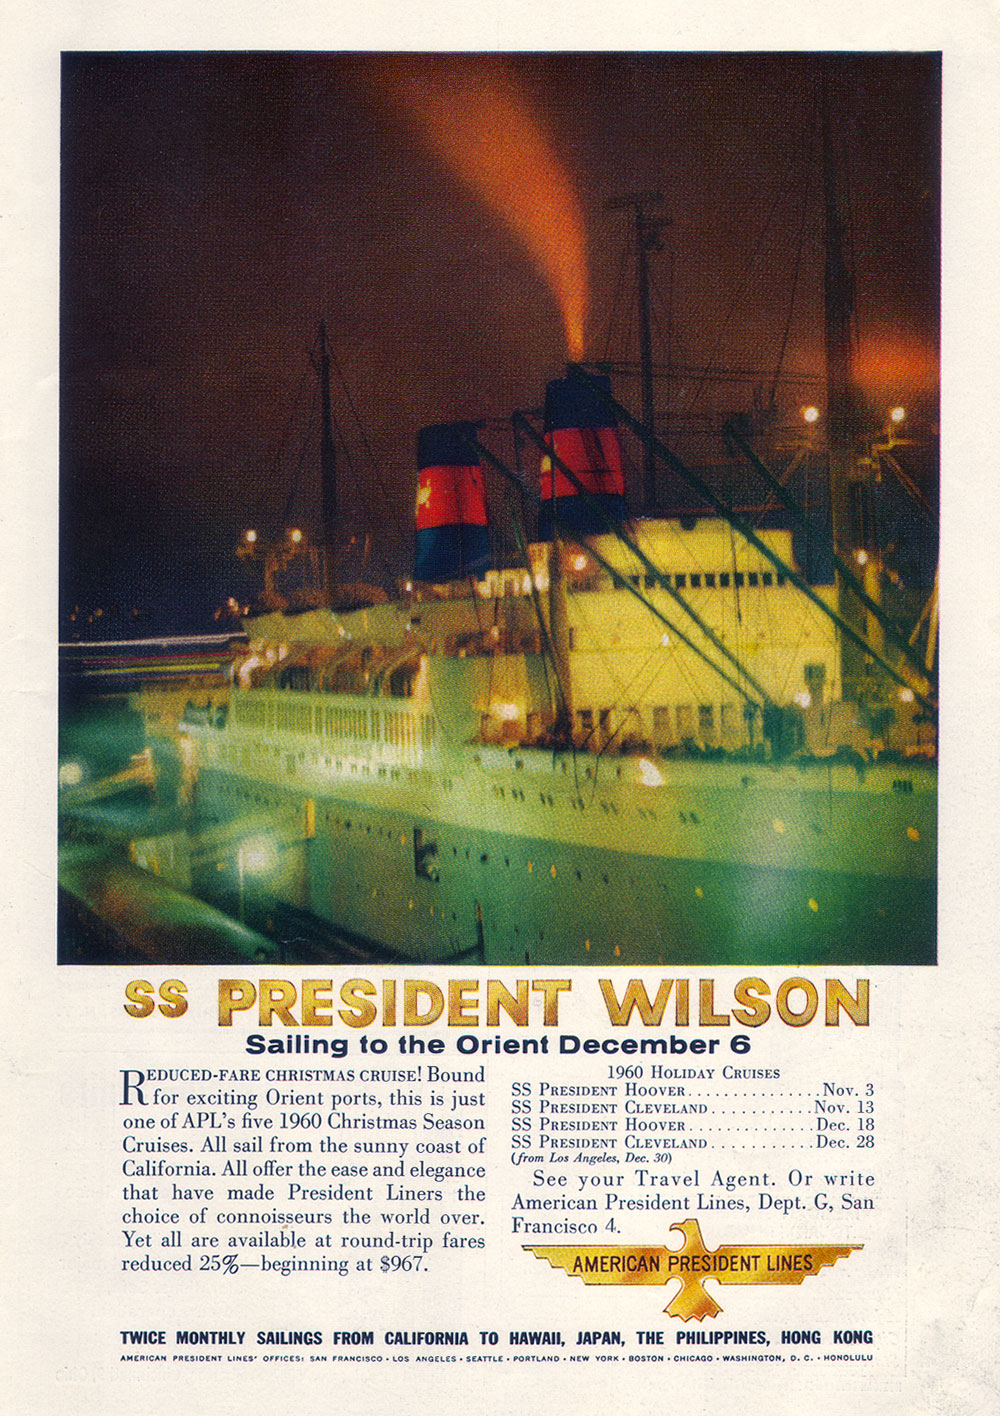 SS President Wilson - American President Lines